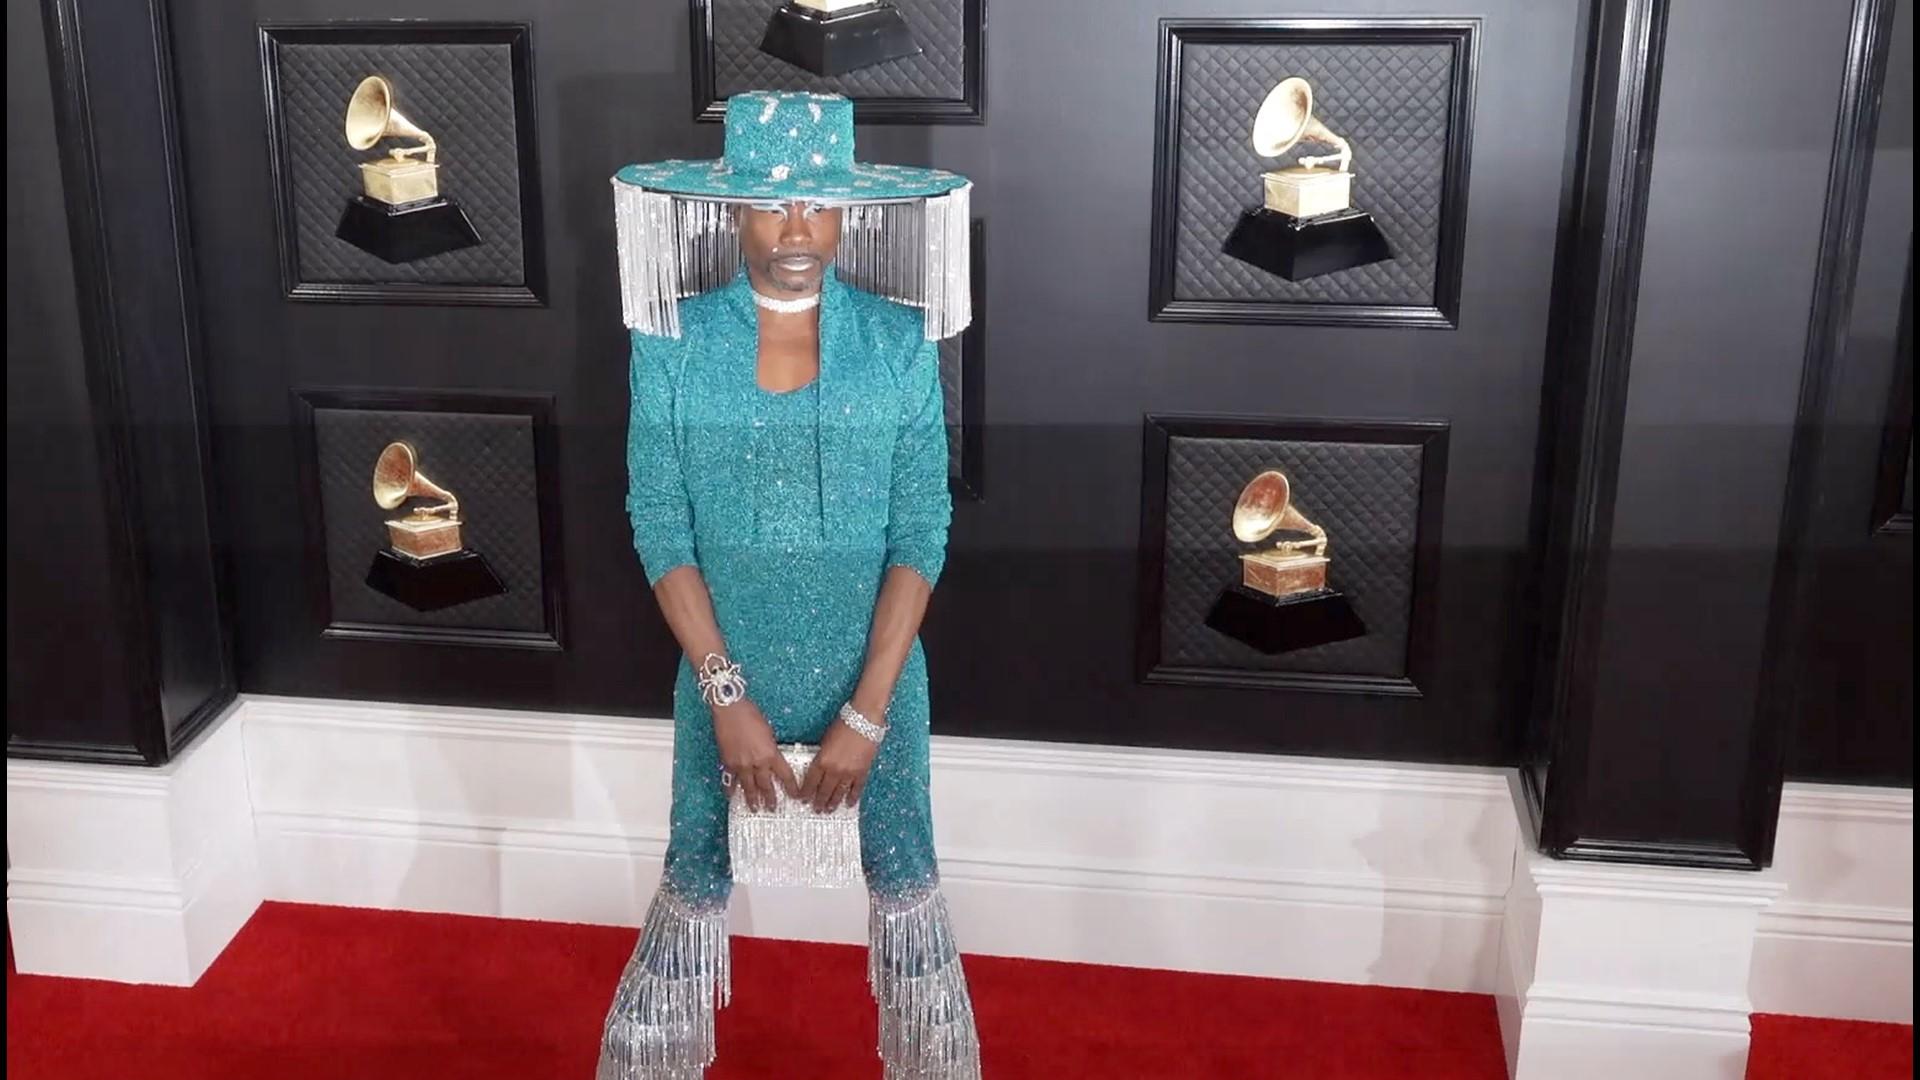 Grammys Announce Nominees For 2021 Show Wbir Com